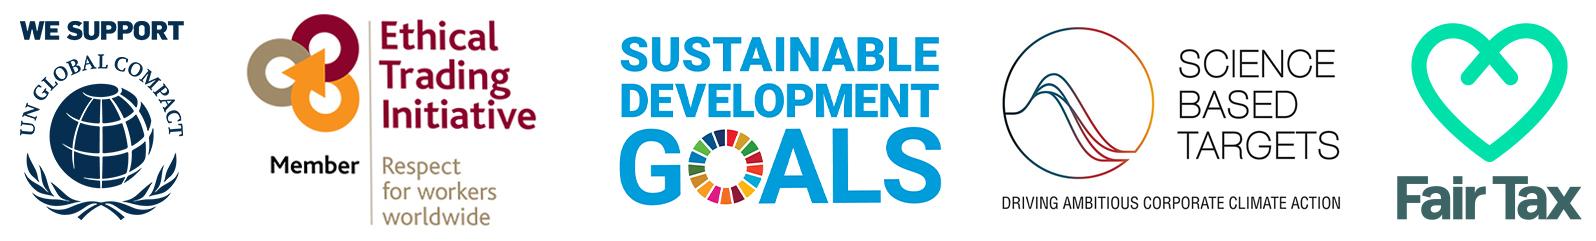 UNGC, ETI, SDG, SBTI and Fair Tax logos